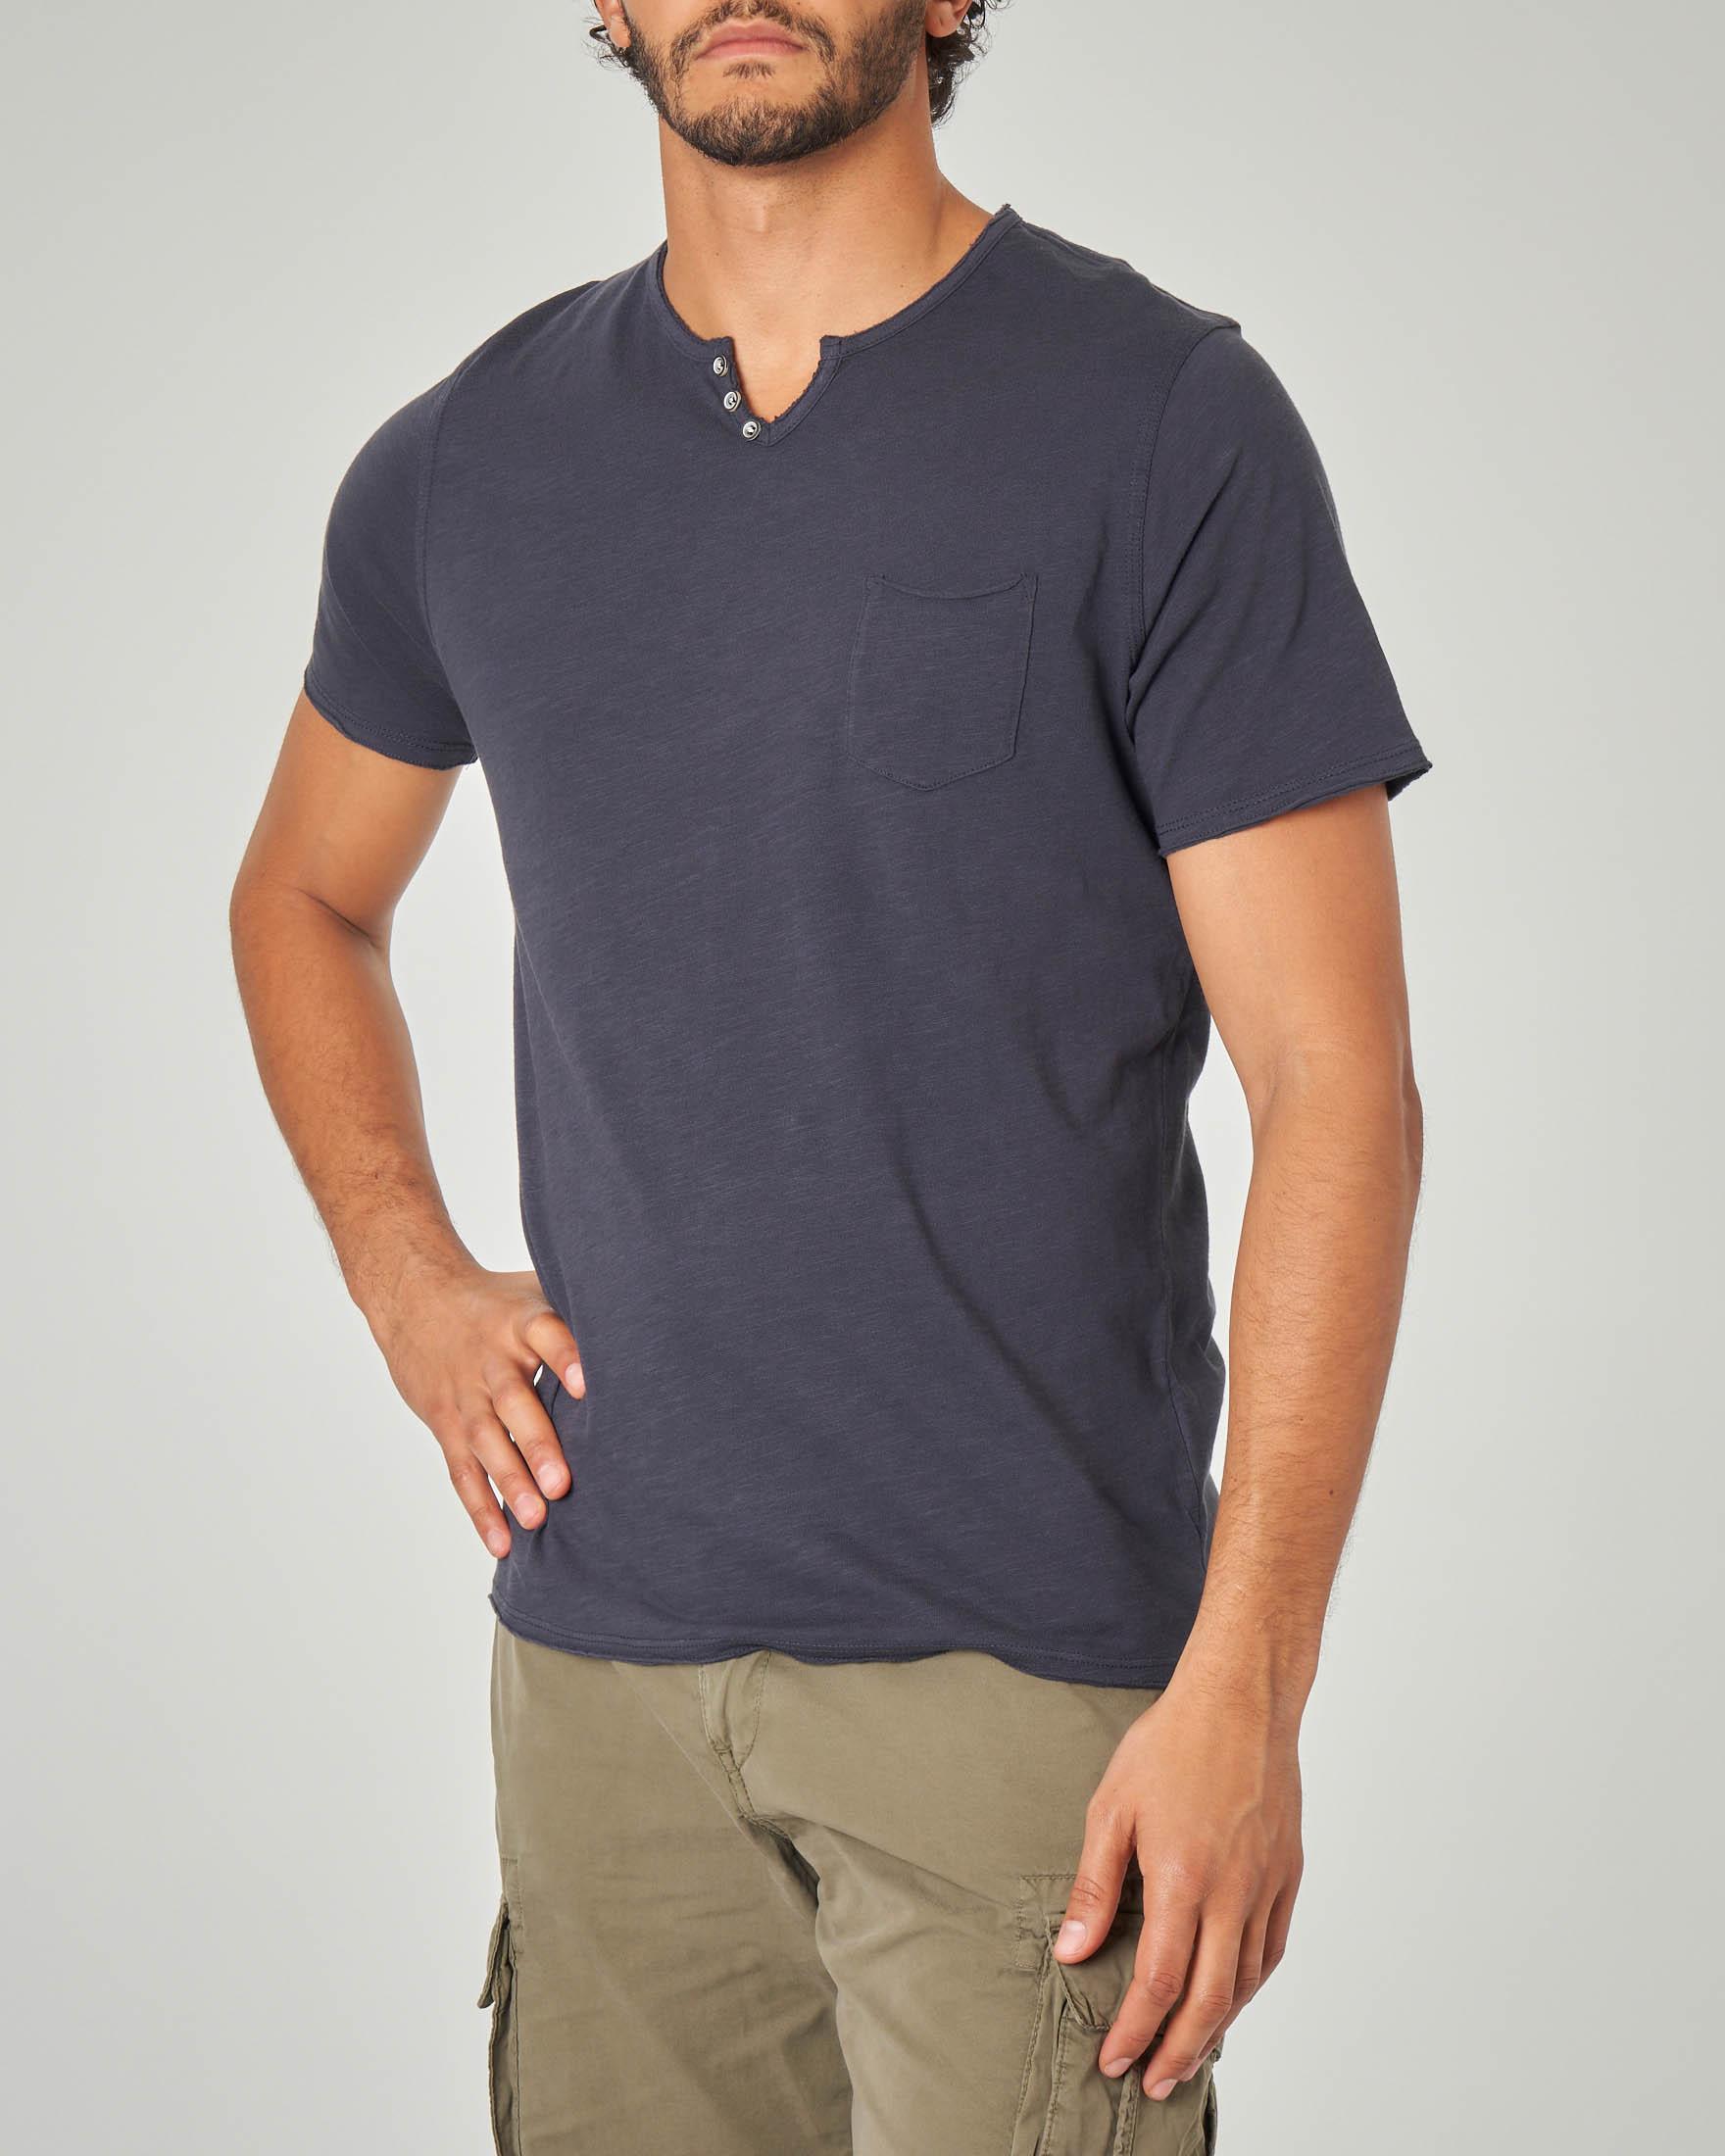 T-shirt blu serafino con taschino